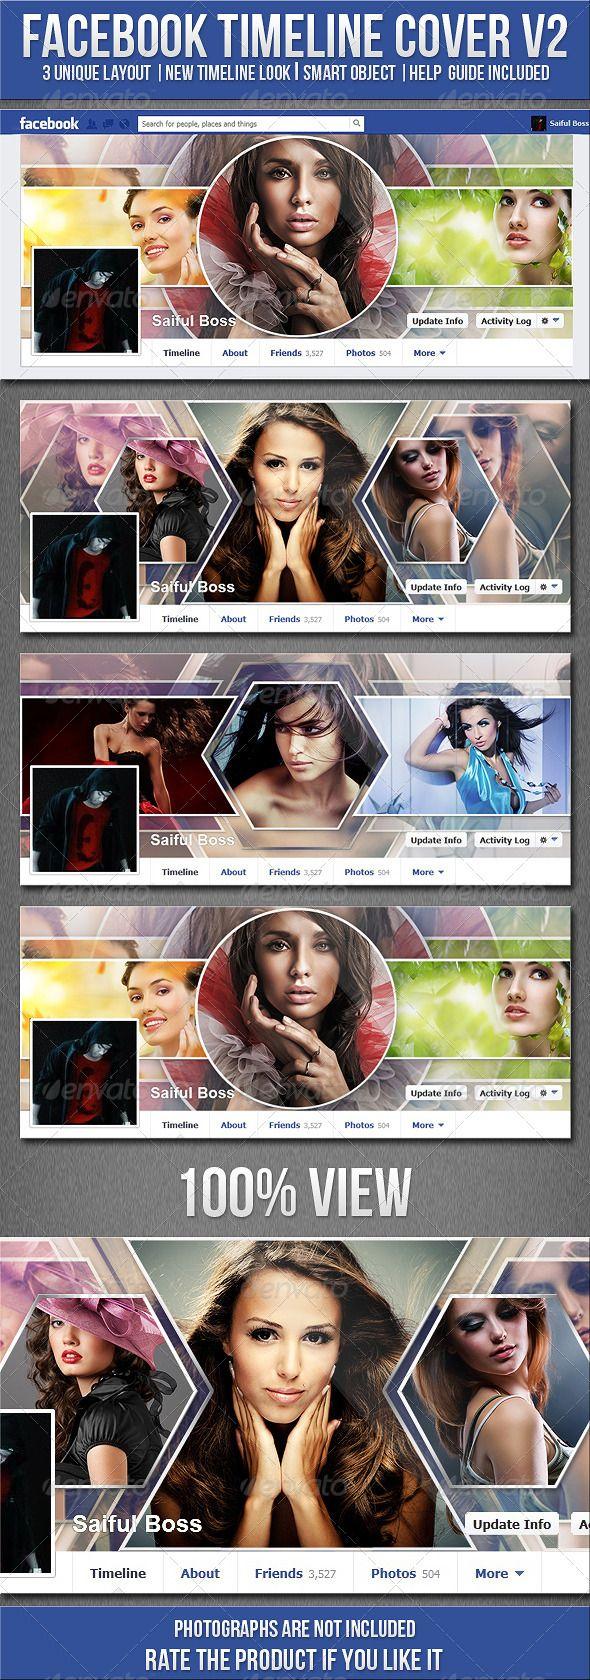 FB Timeline Cover V2